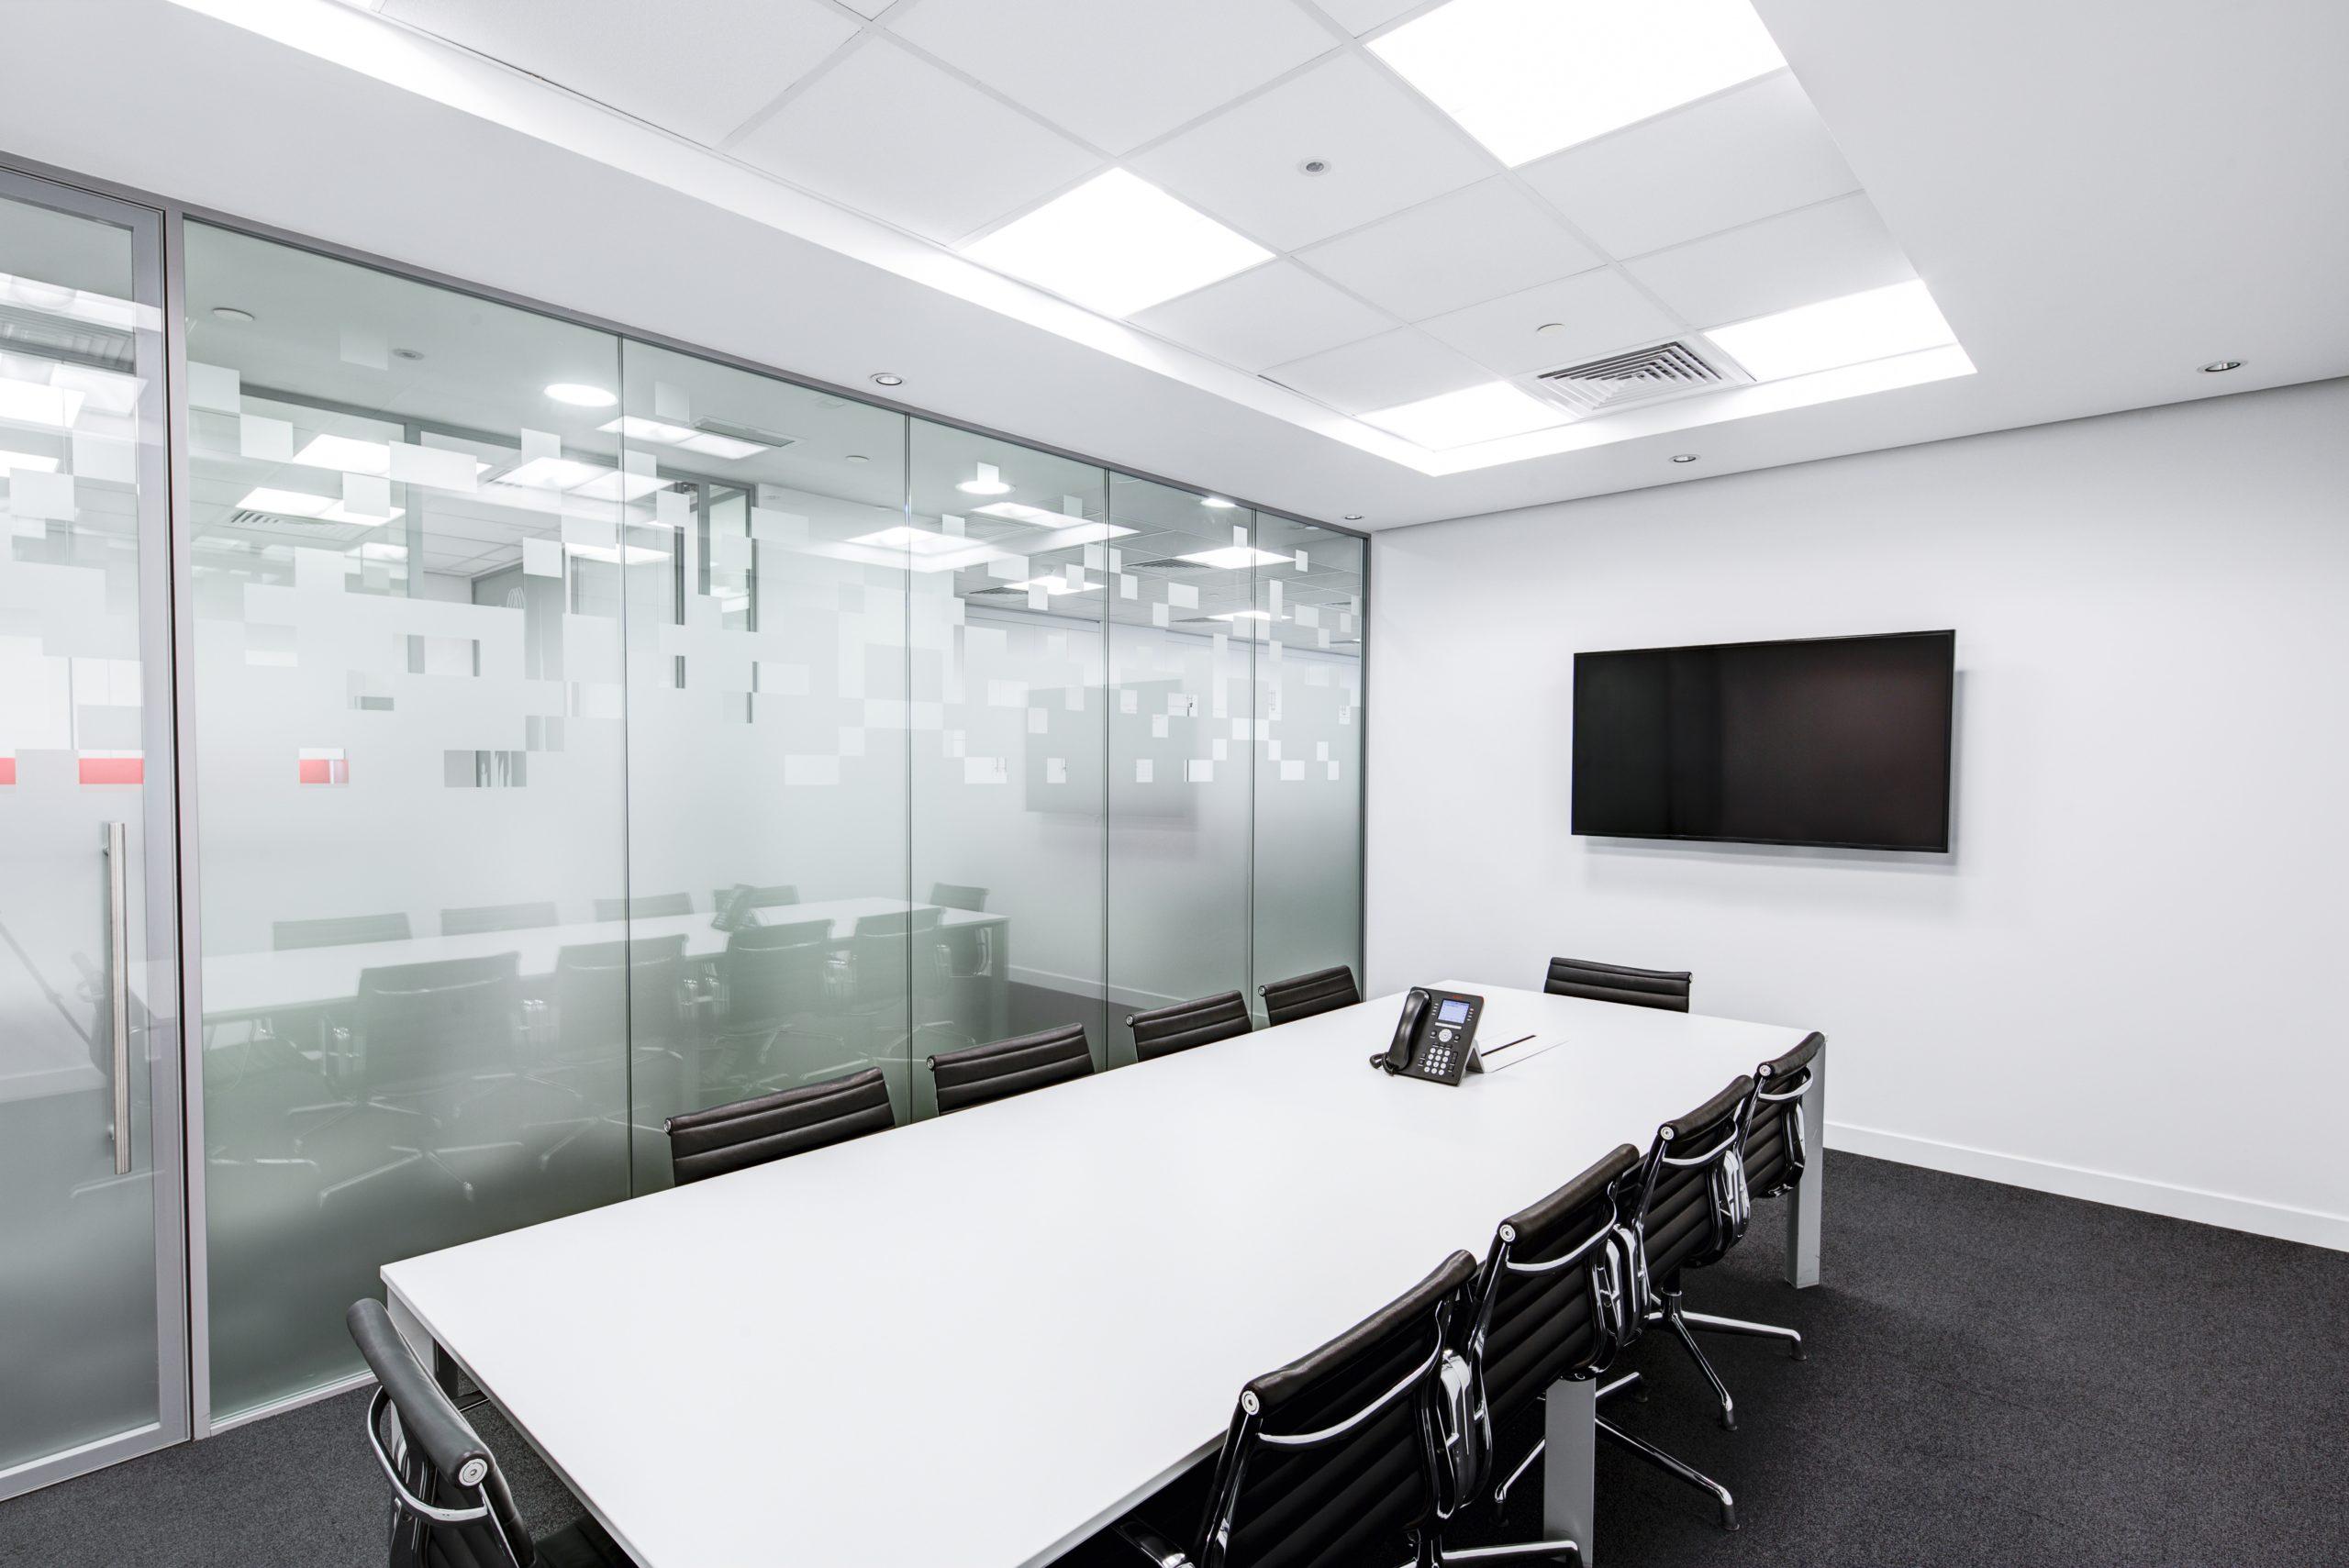 black and white board boardroom business 260689 scaled 1 - black-and-white-board-boardroom-business-260689-scaled.jpg